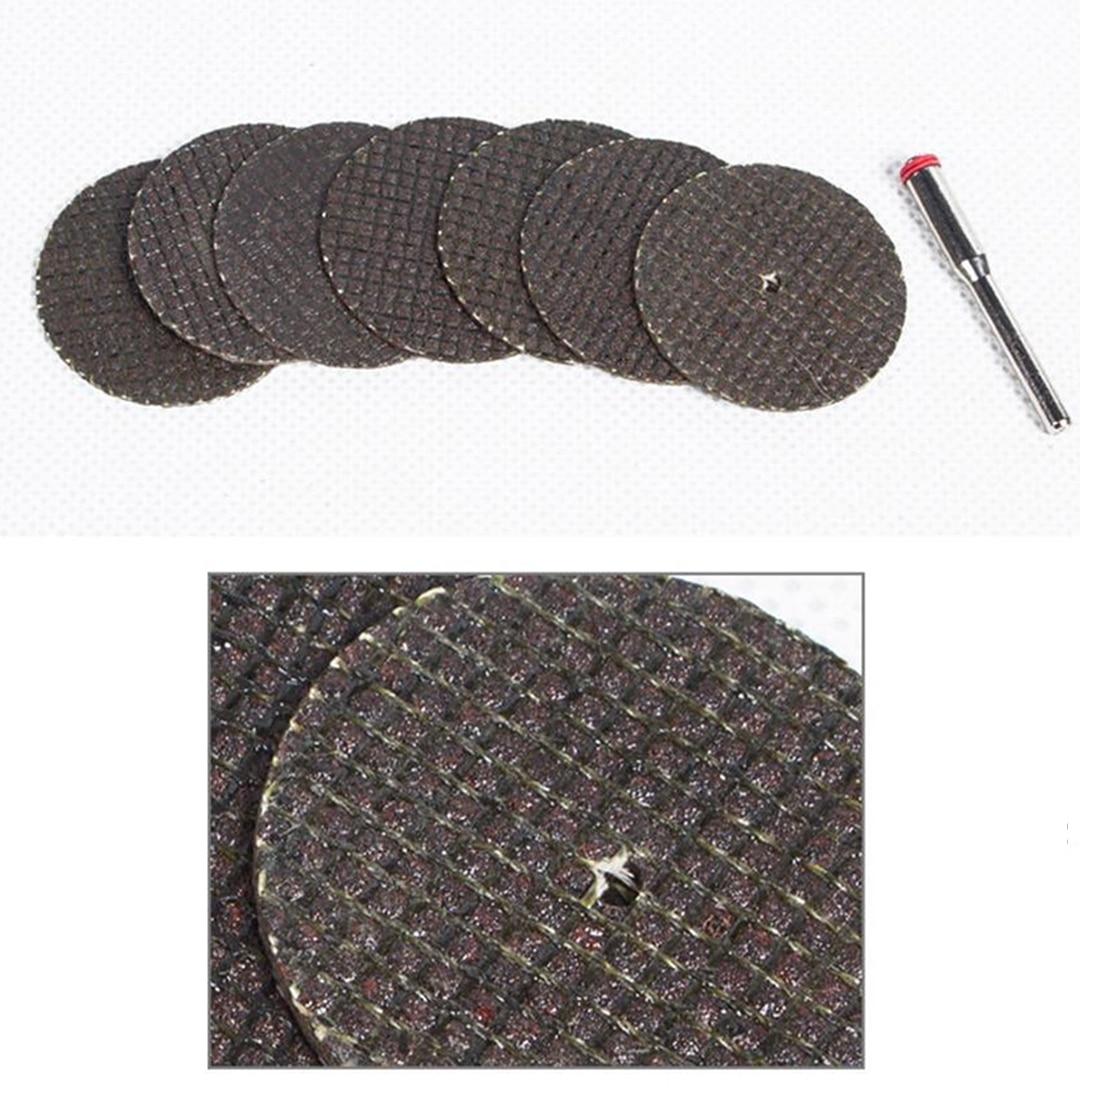 Top Dremel Accessories 30Pcs 32mm Resin Fiber Abrasive Tool Cutting Discs Cut Off Wheel Sanding Discs Rotary Dremel